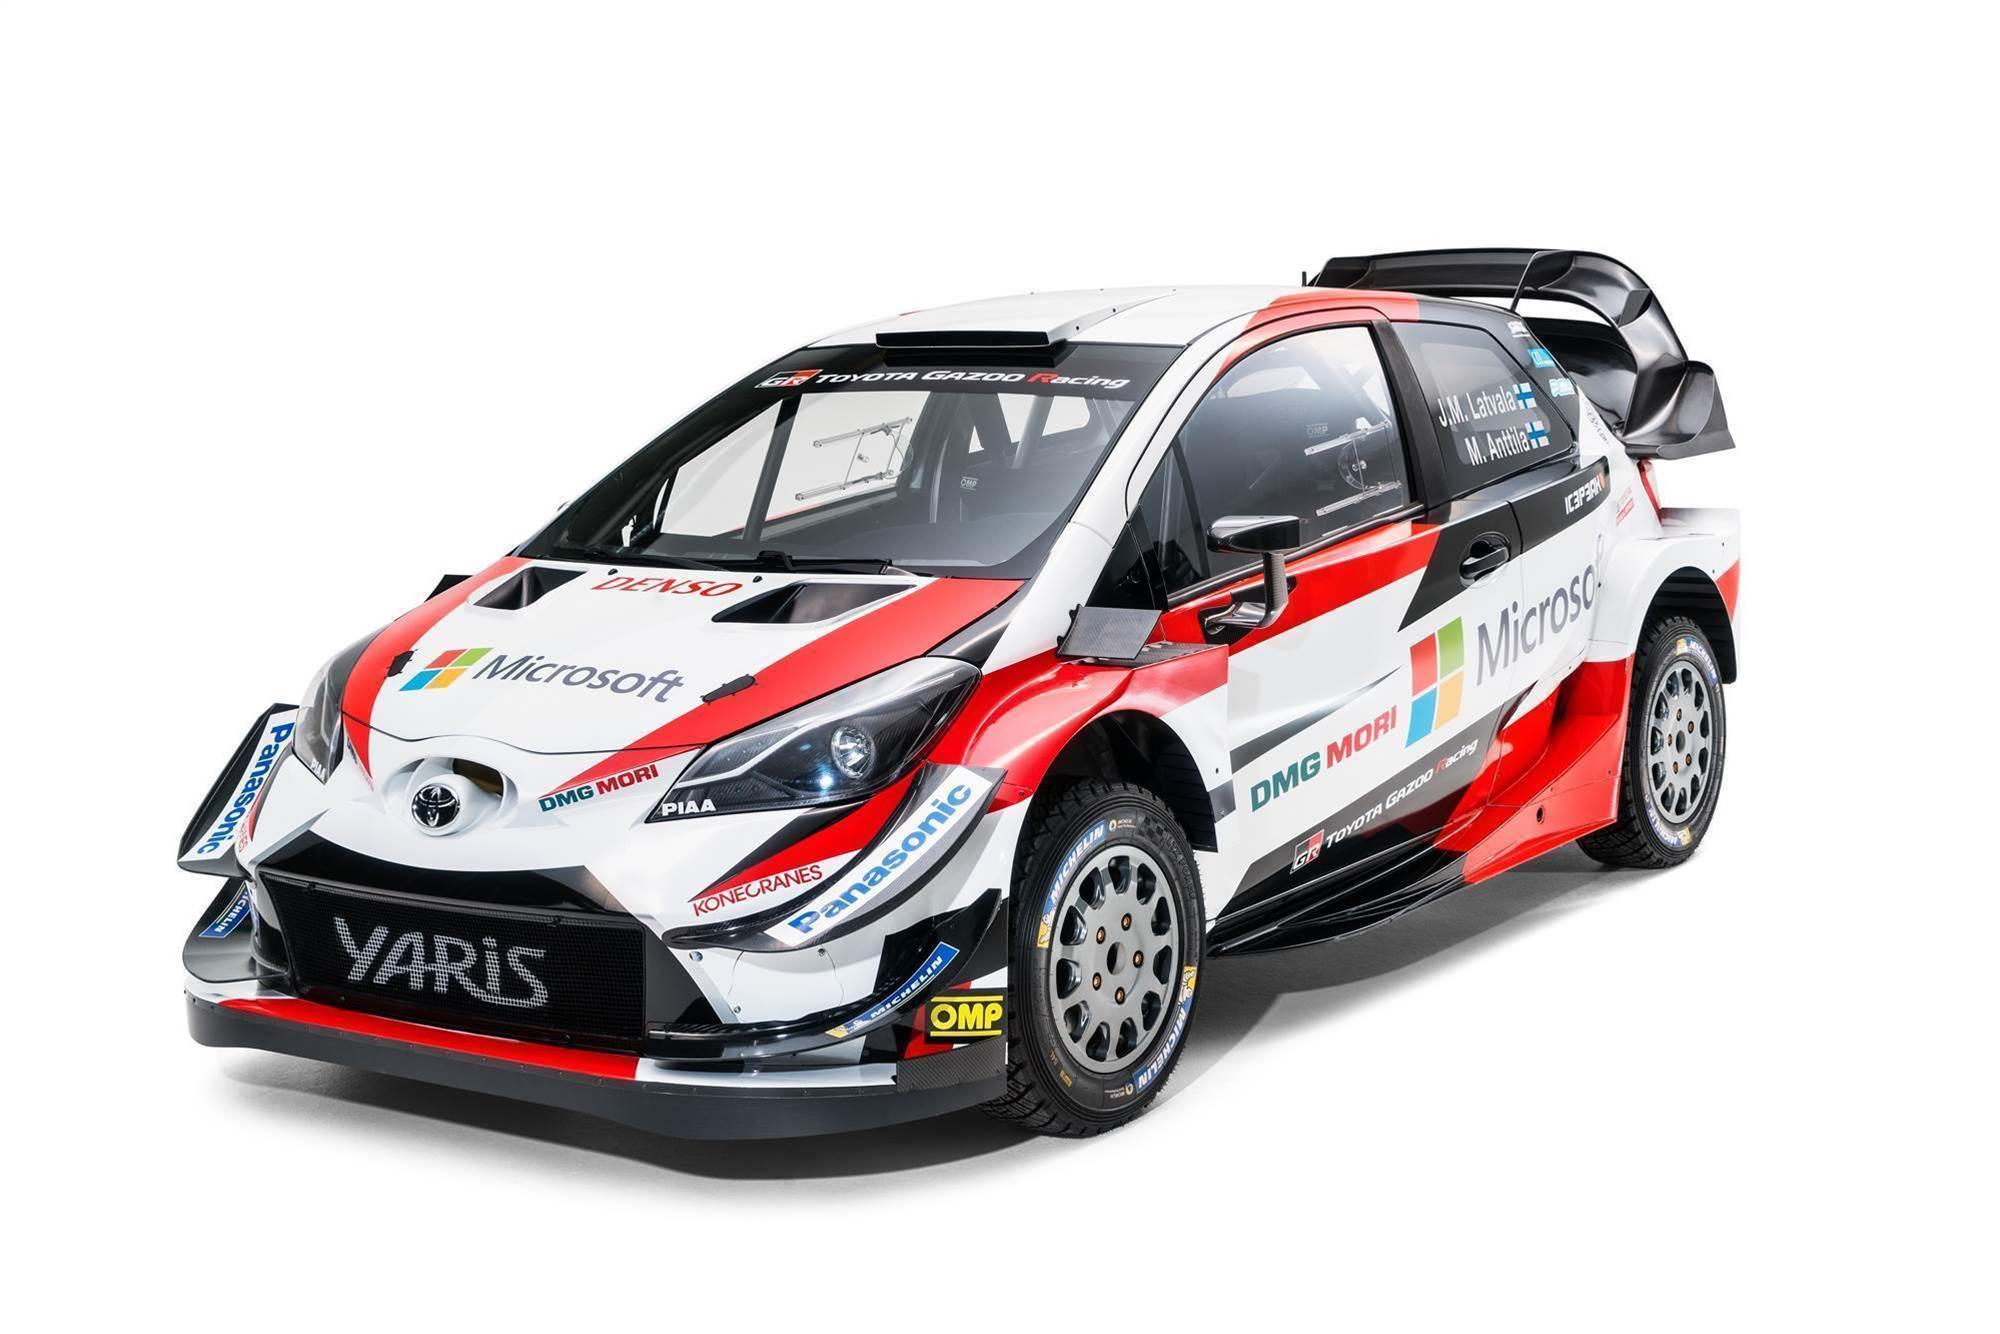 Toyota unveils new wrc contender